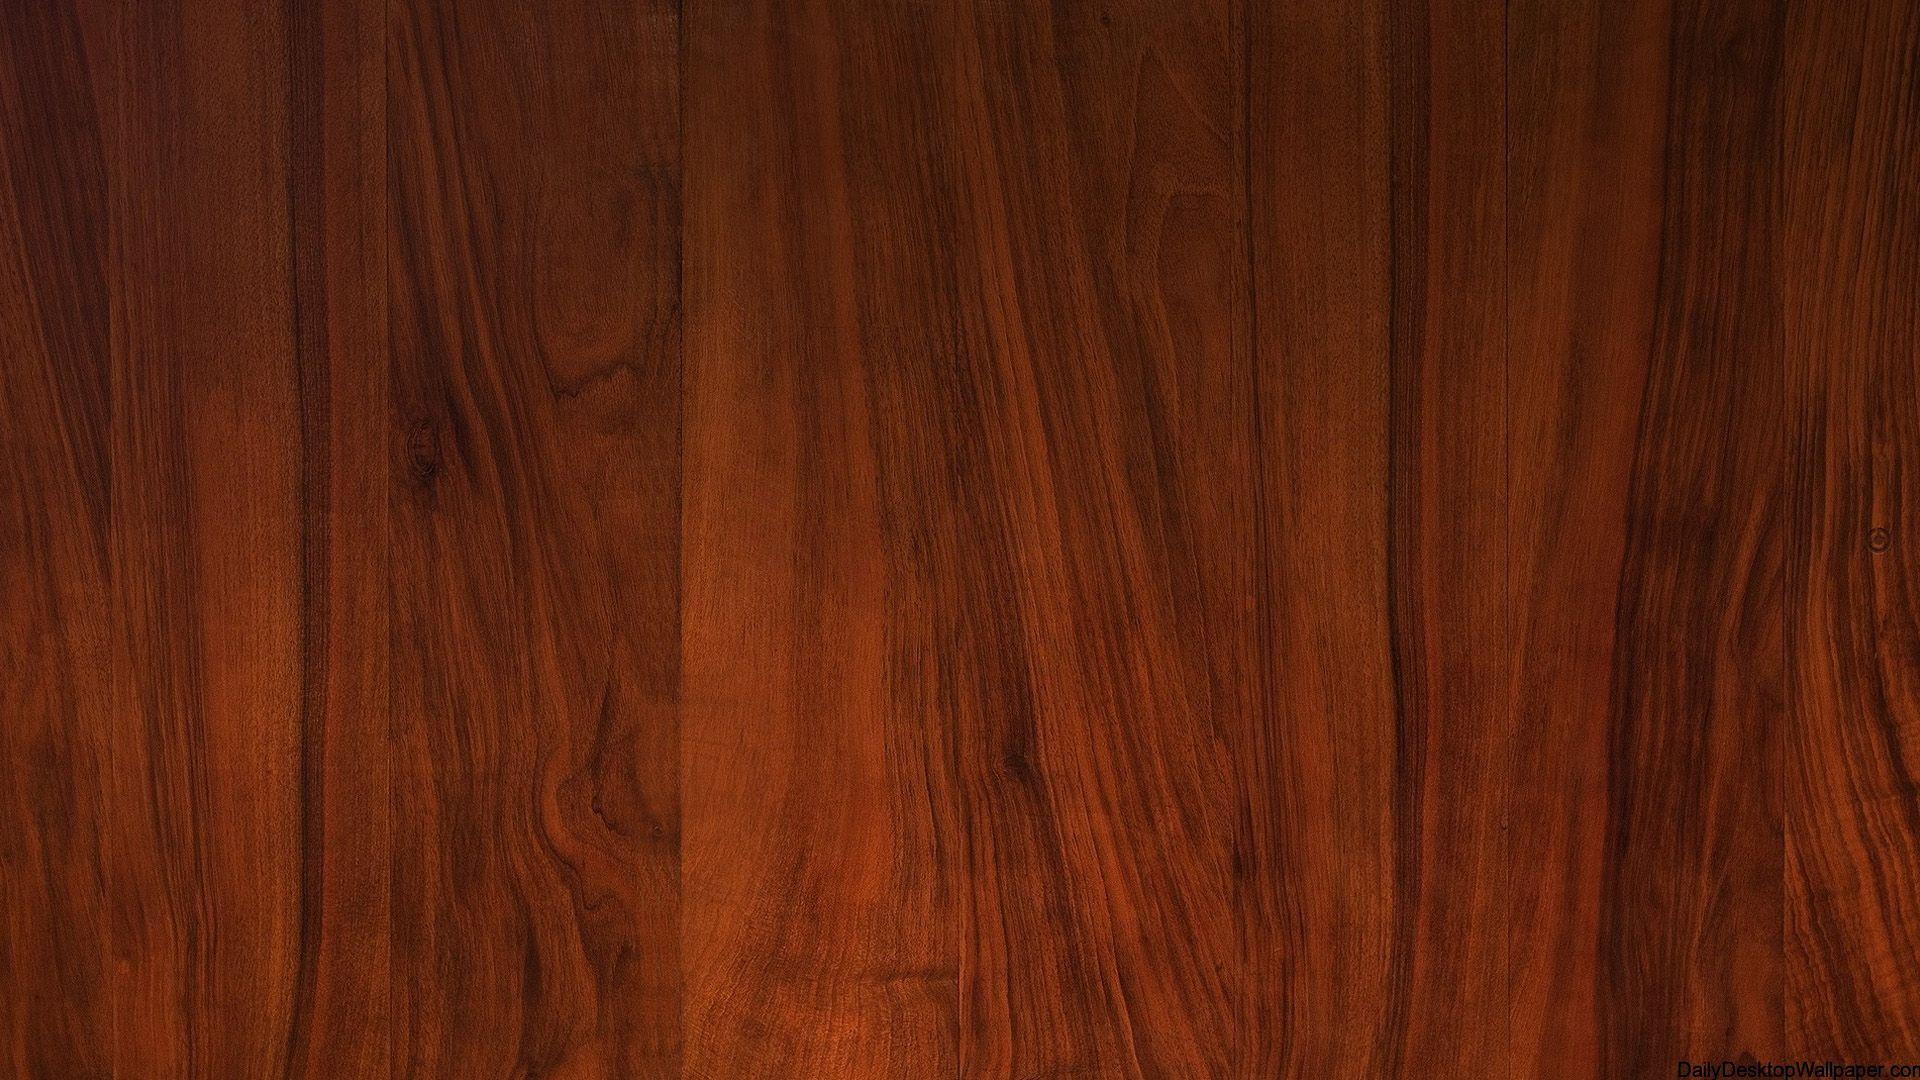 Dark wood texture 07 Wallpapers HD 1920x1080.jpg (1920